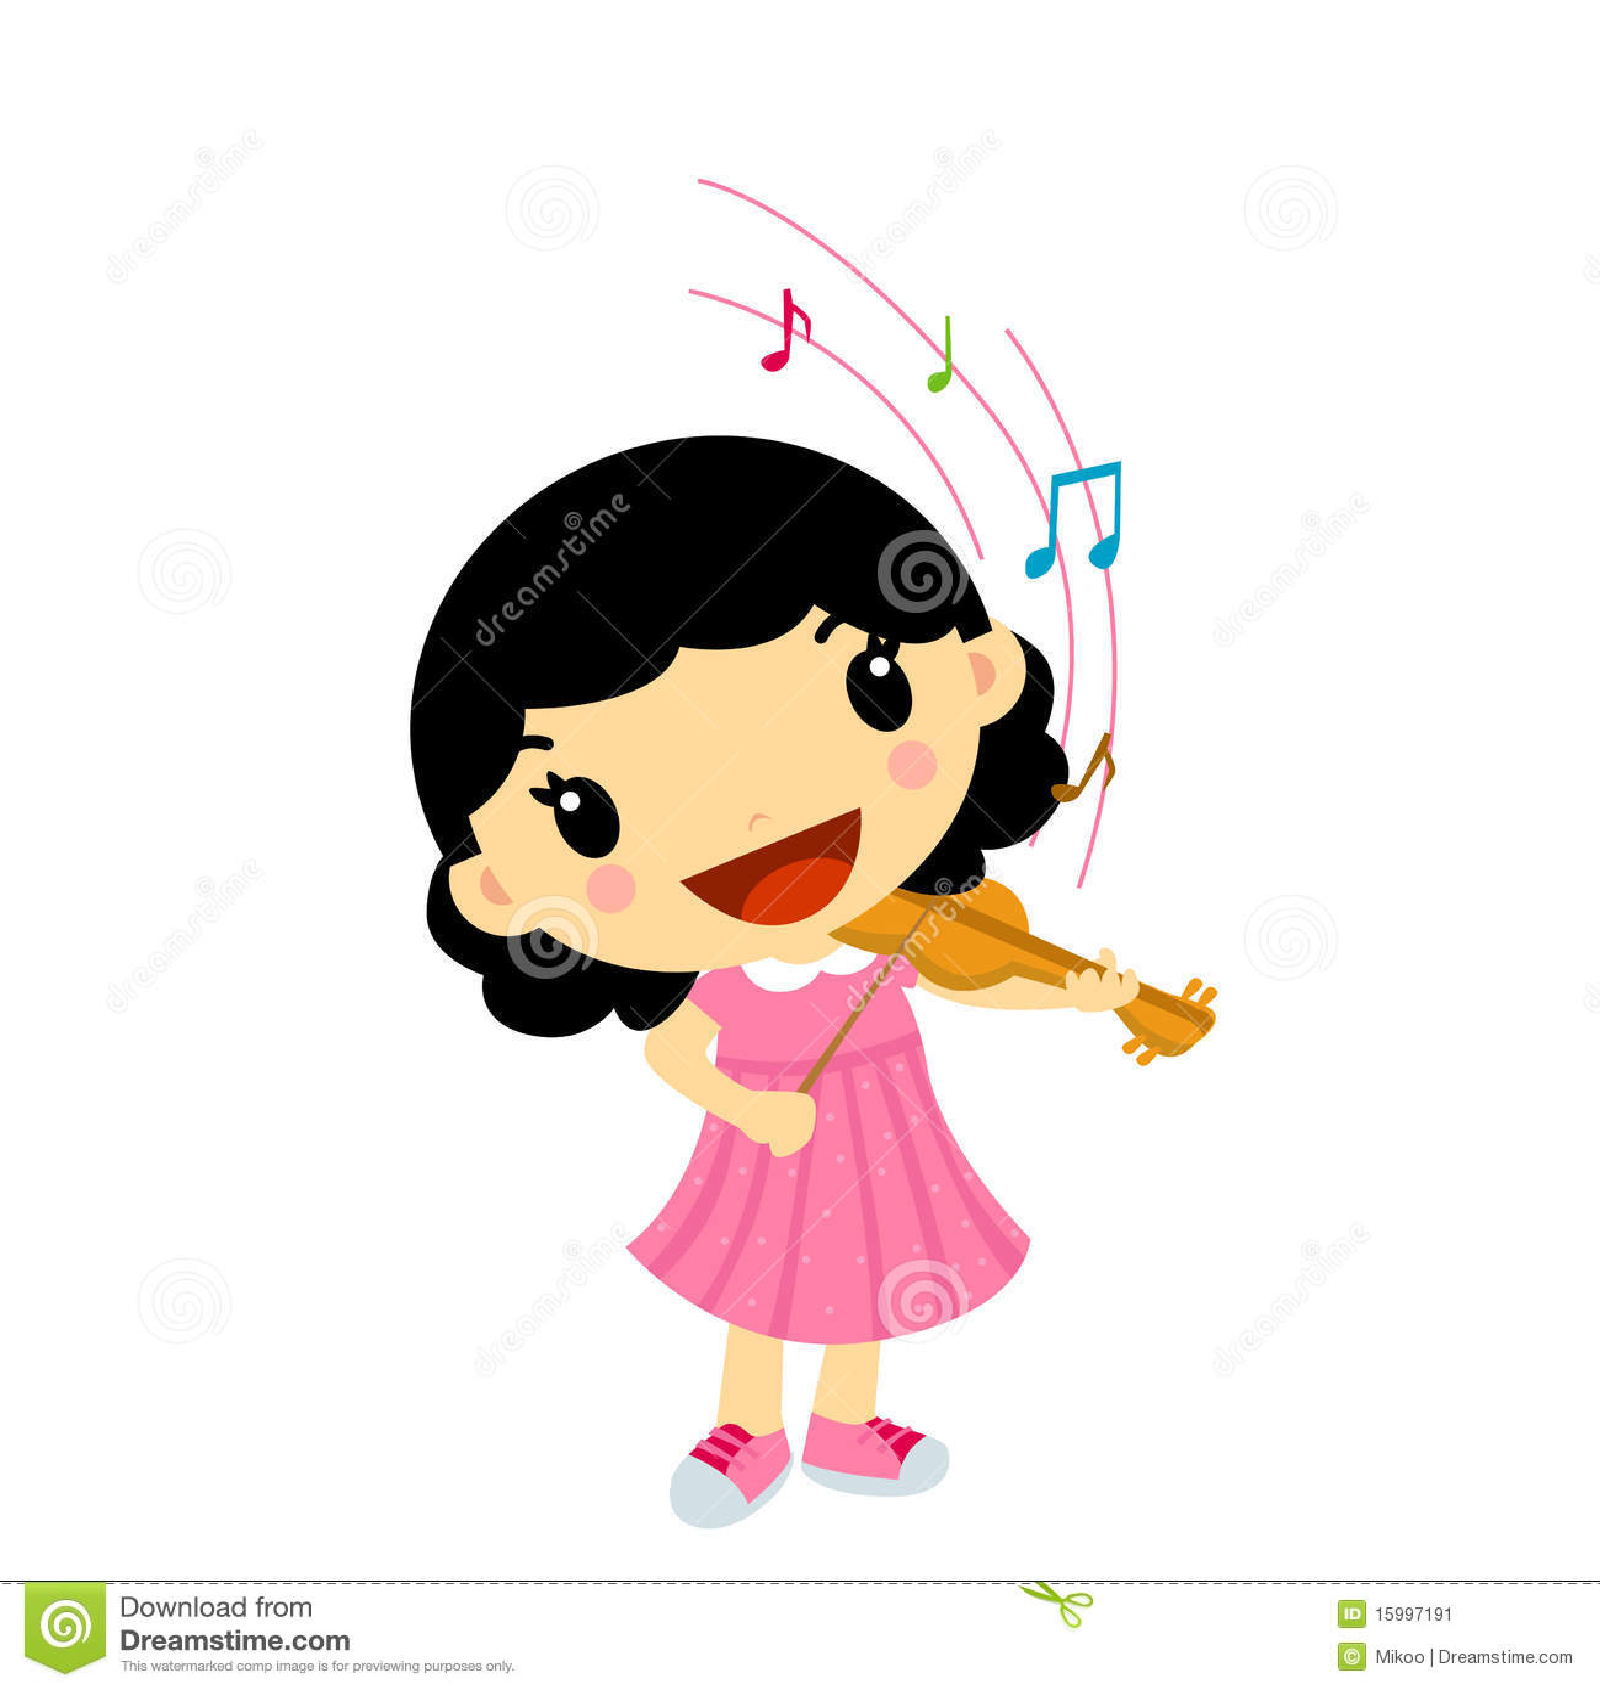 girl playing violin stock illustrations – 448 girl playing violin